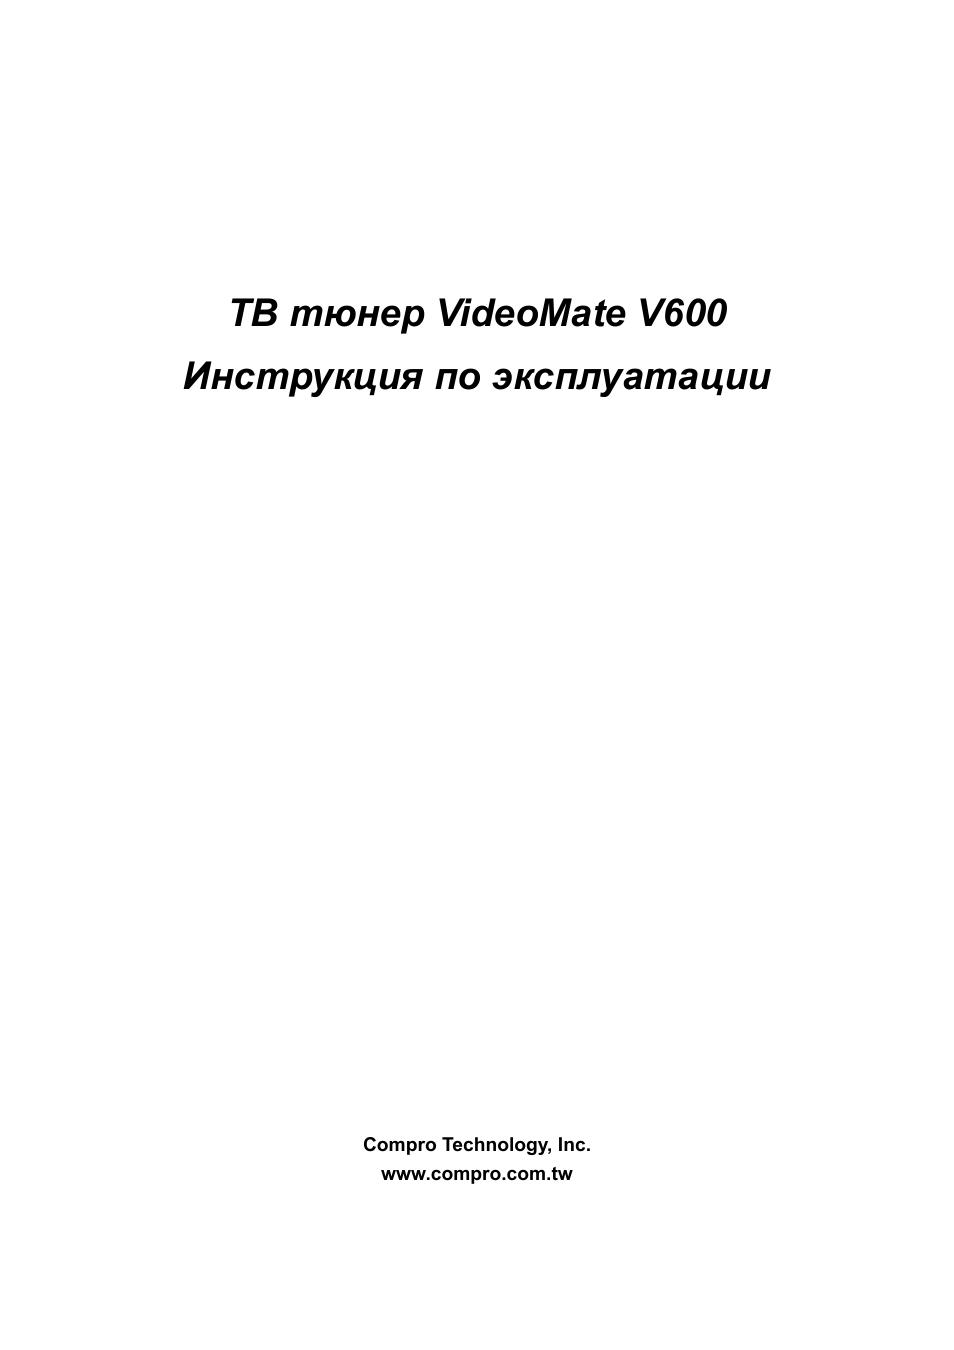 Compro VideoMate V600 Standalone